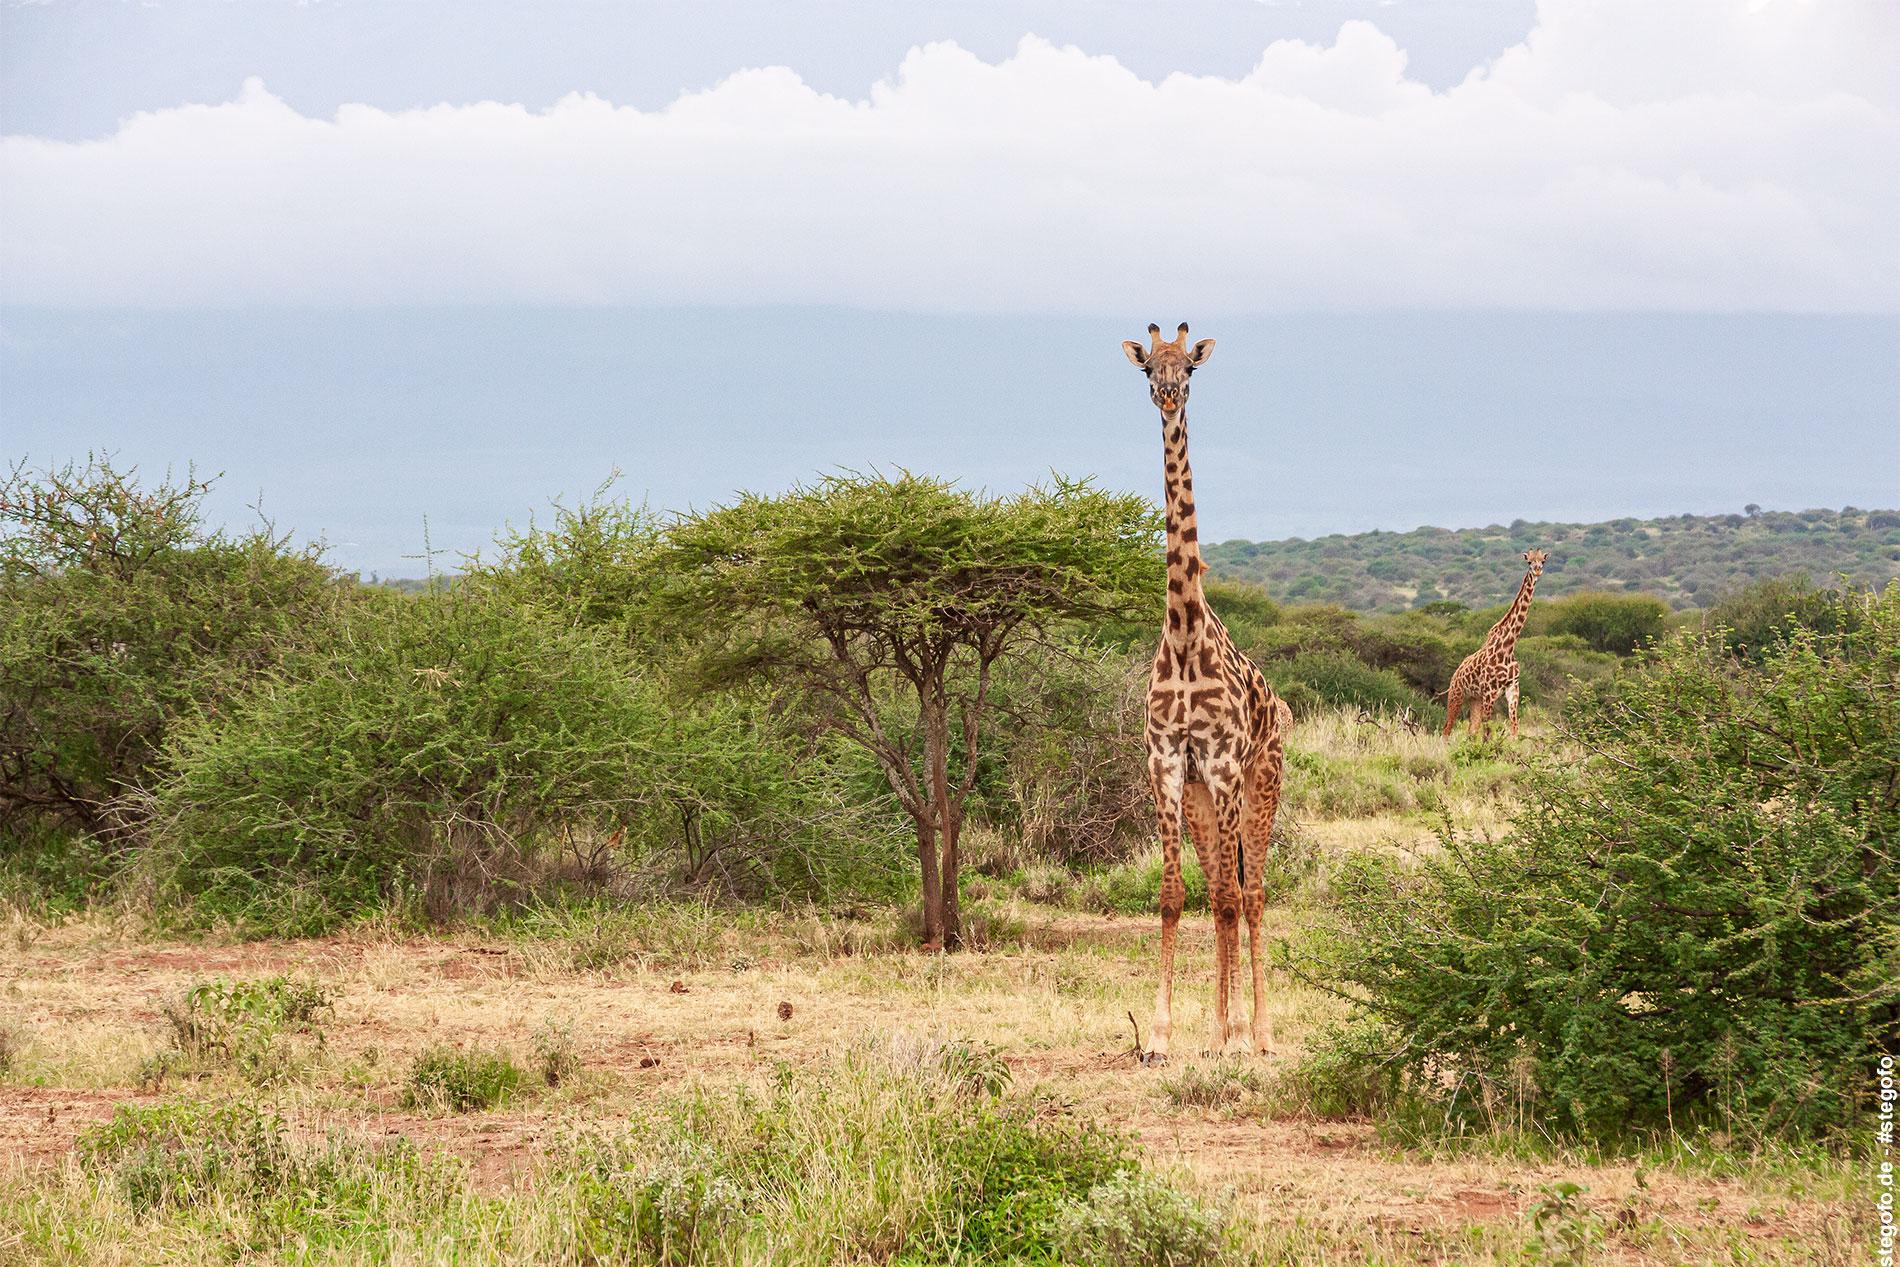 Die neugierige Giraffe